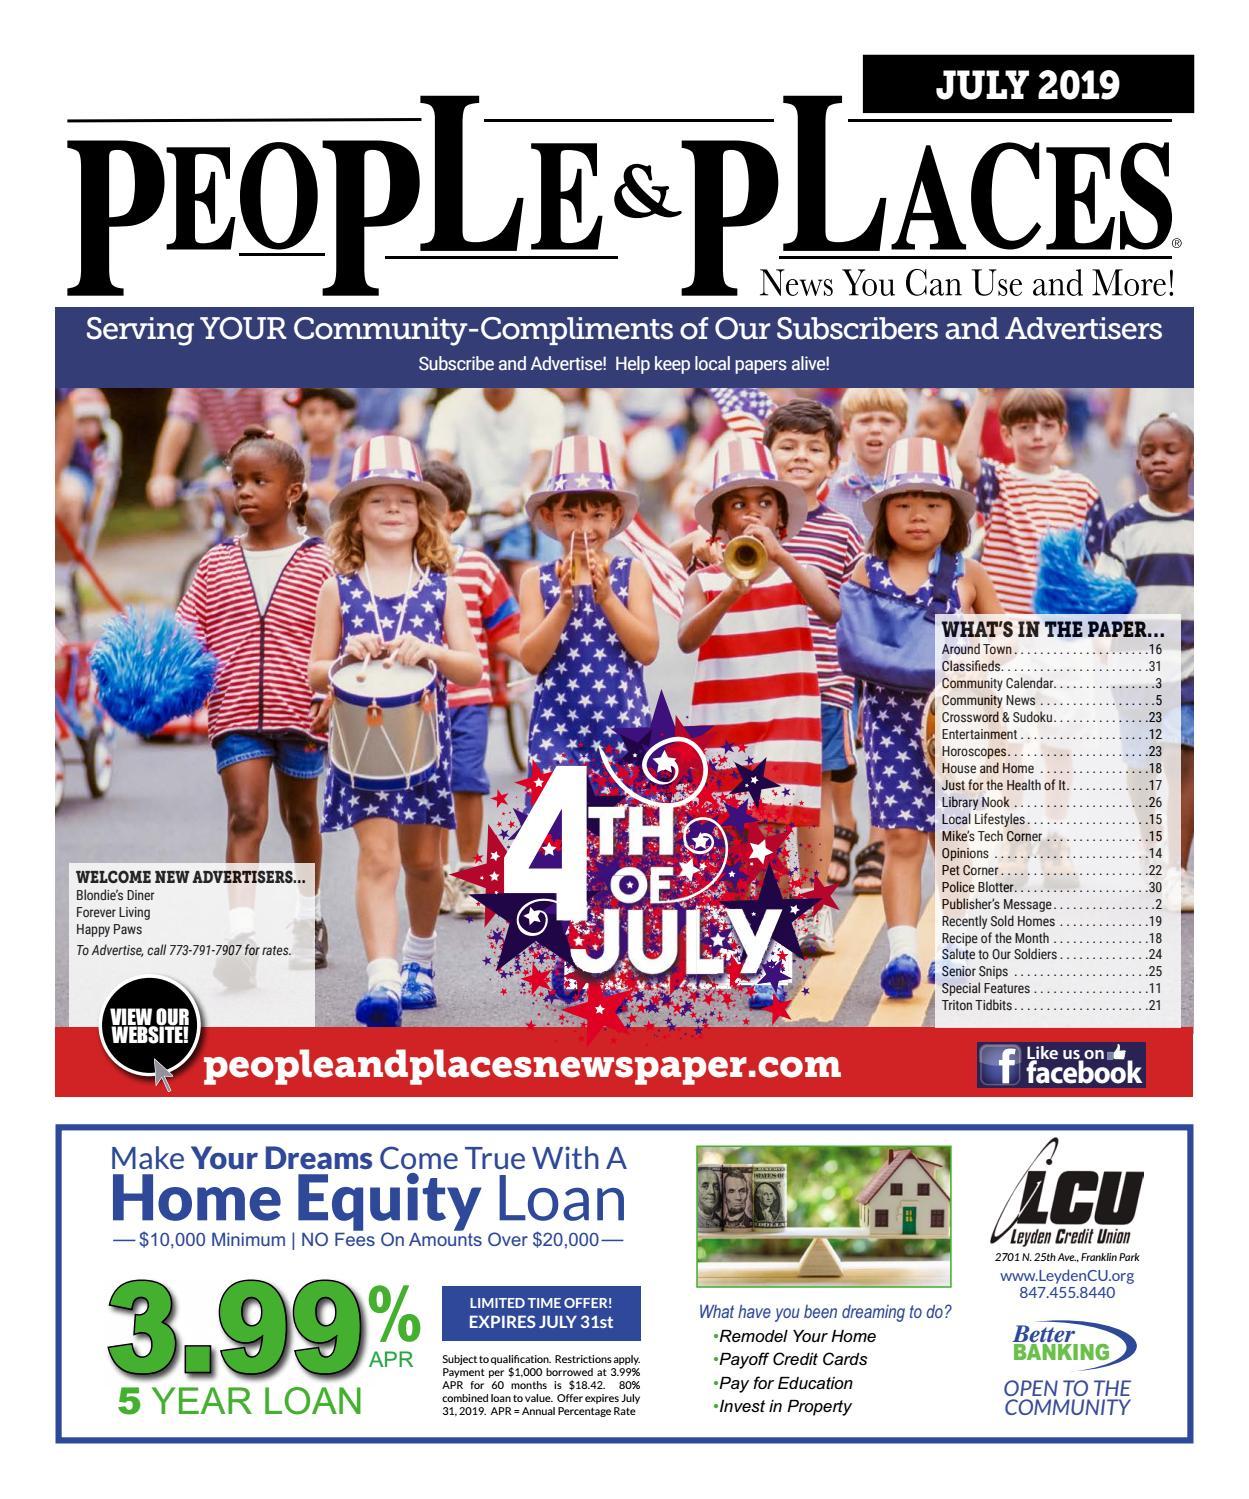 JULY 2019 People & Places Newspaper by Jennifer Creative - issuu